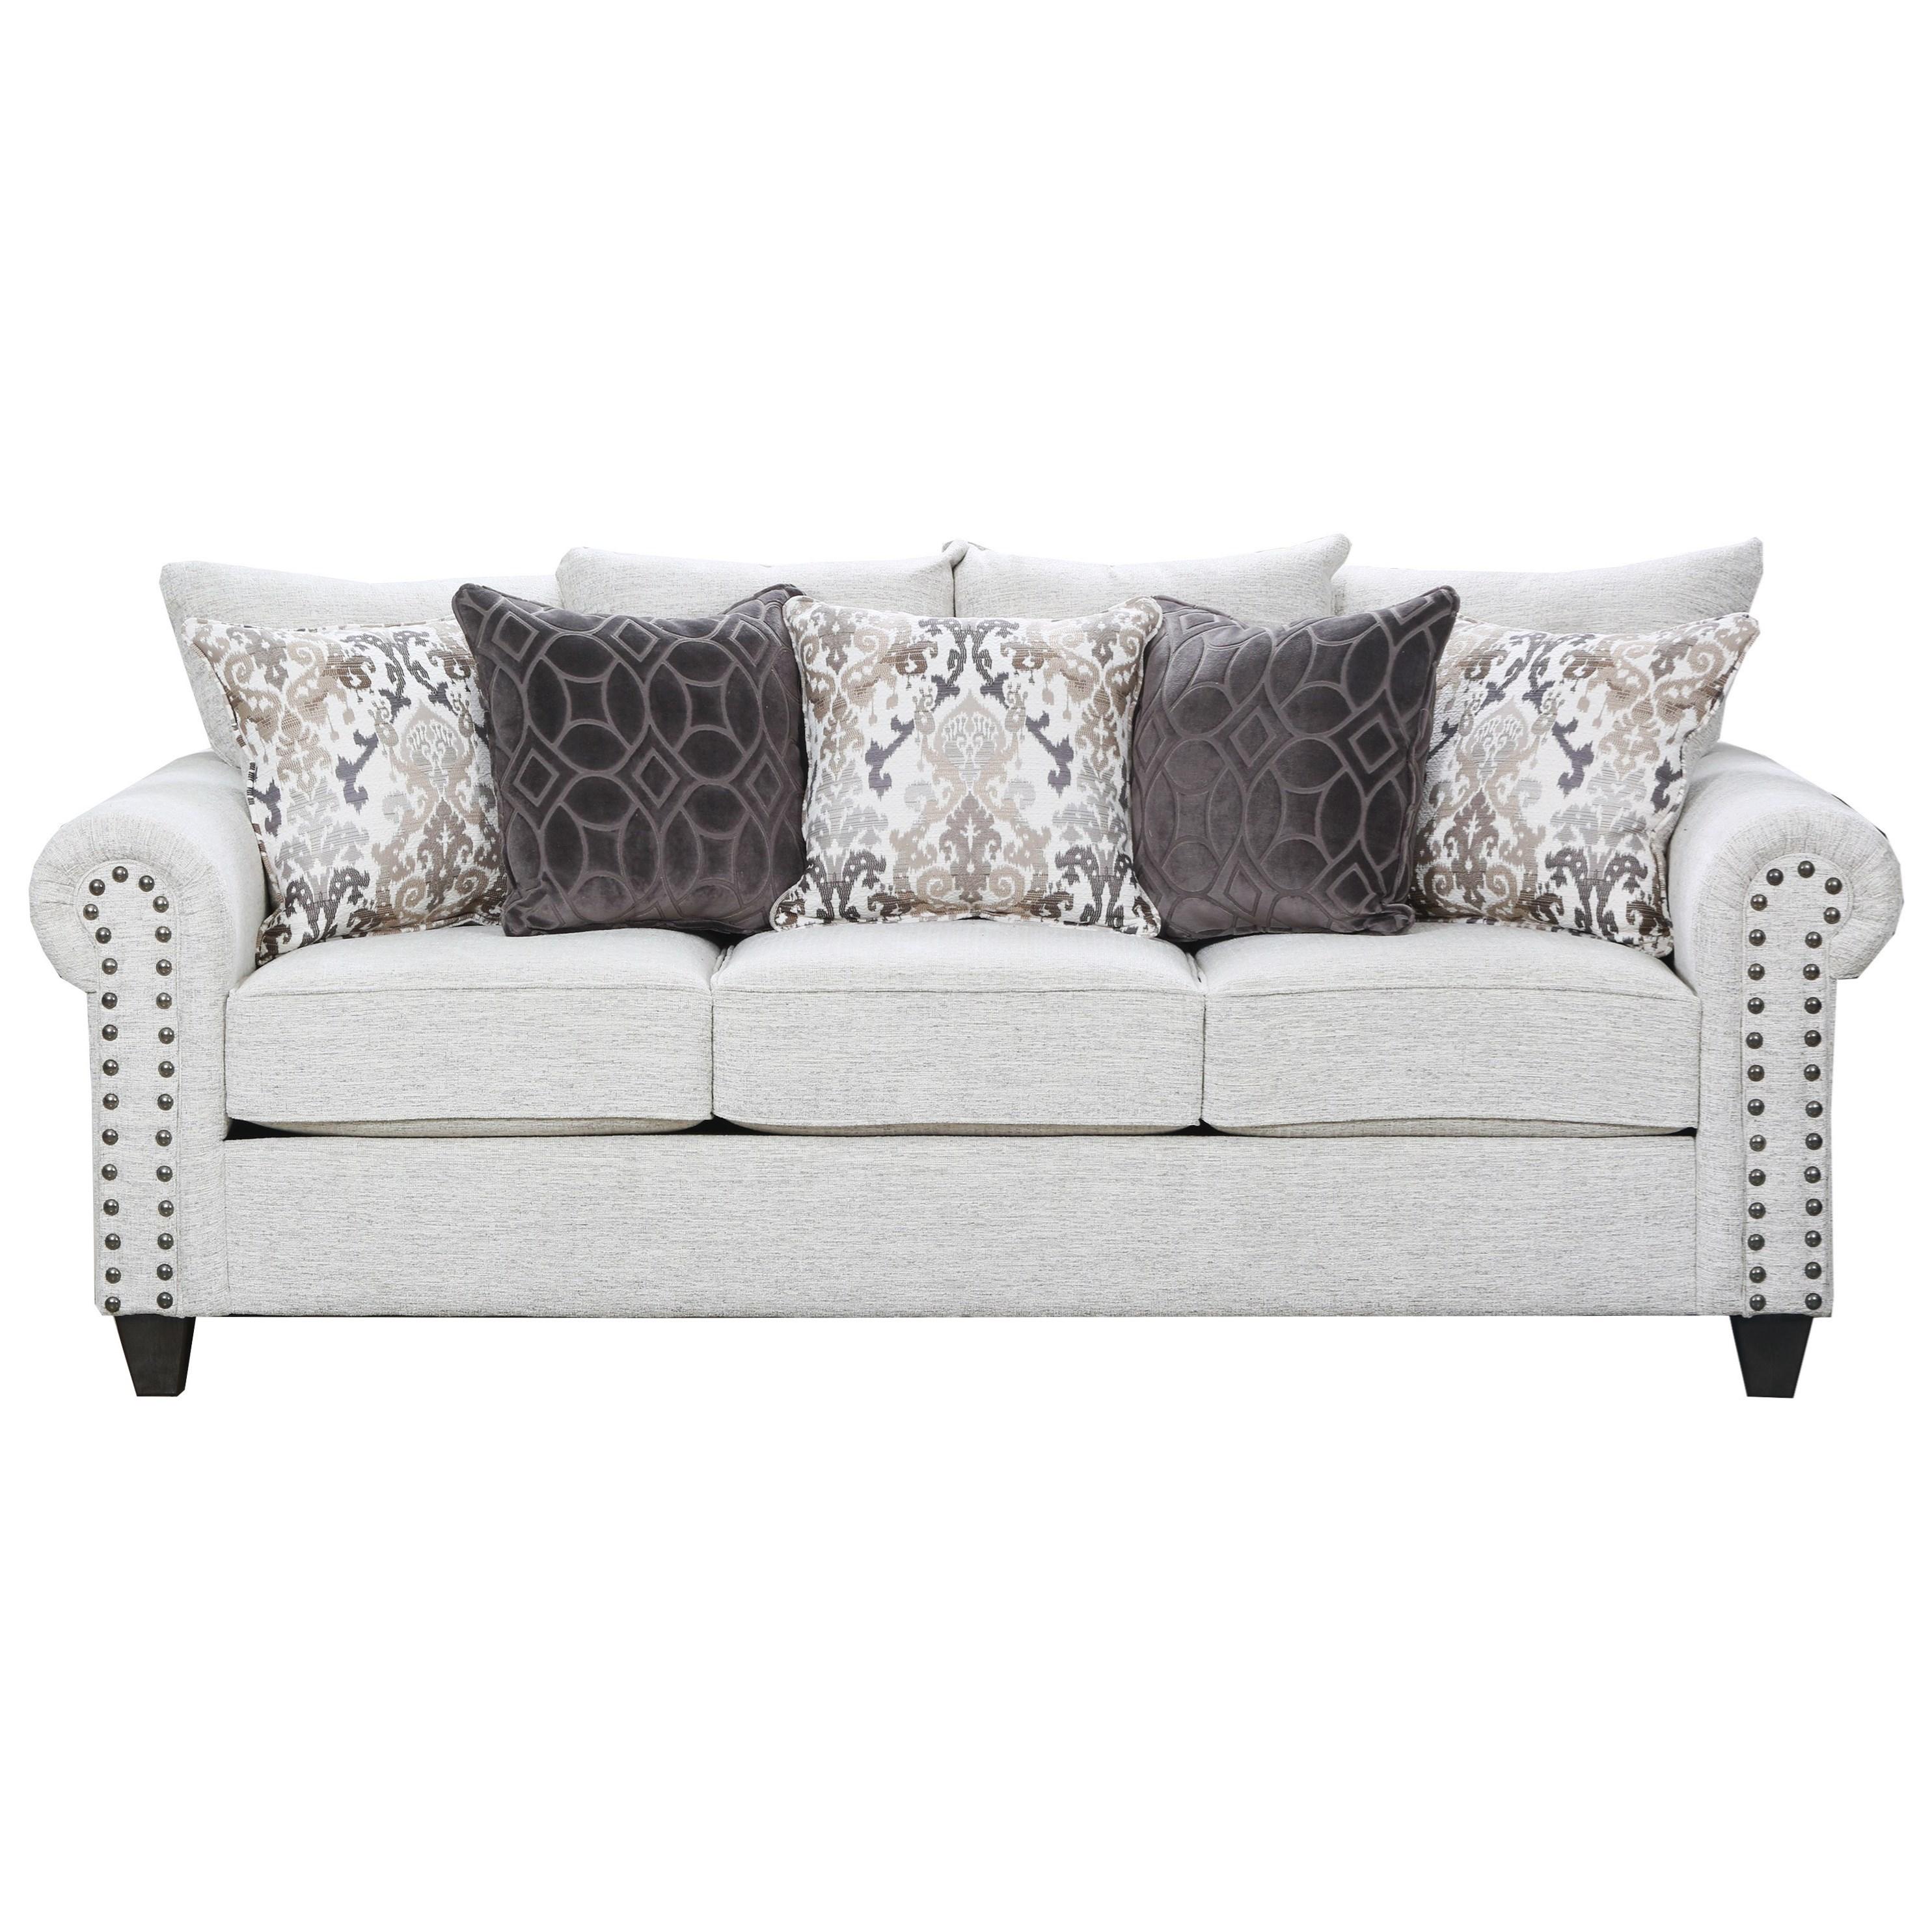 9175BR Sofa by United Furniture Industries at Pilgrim Furniture City